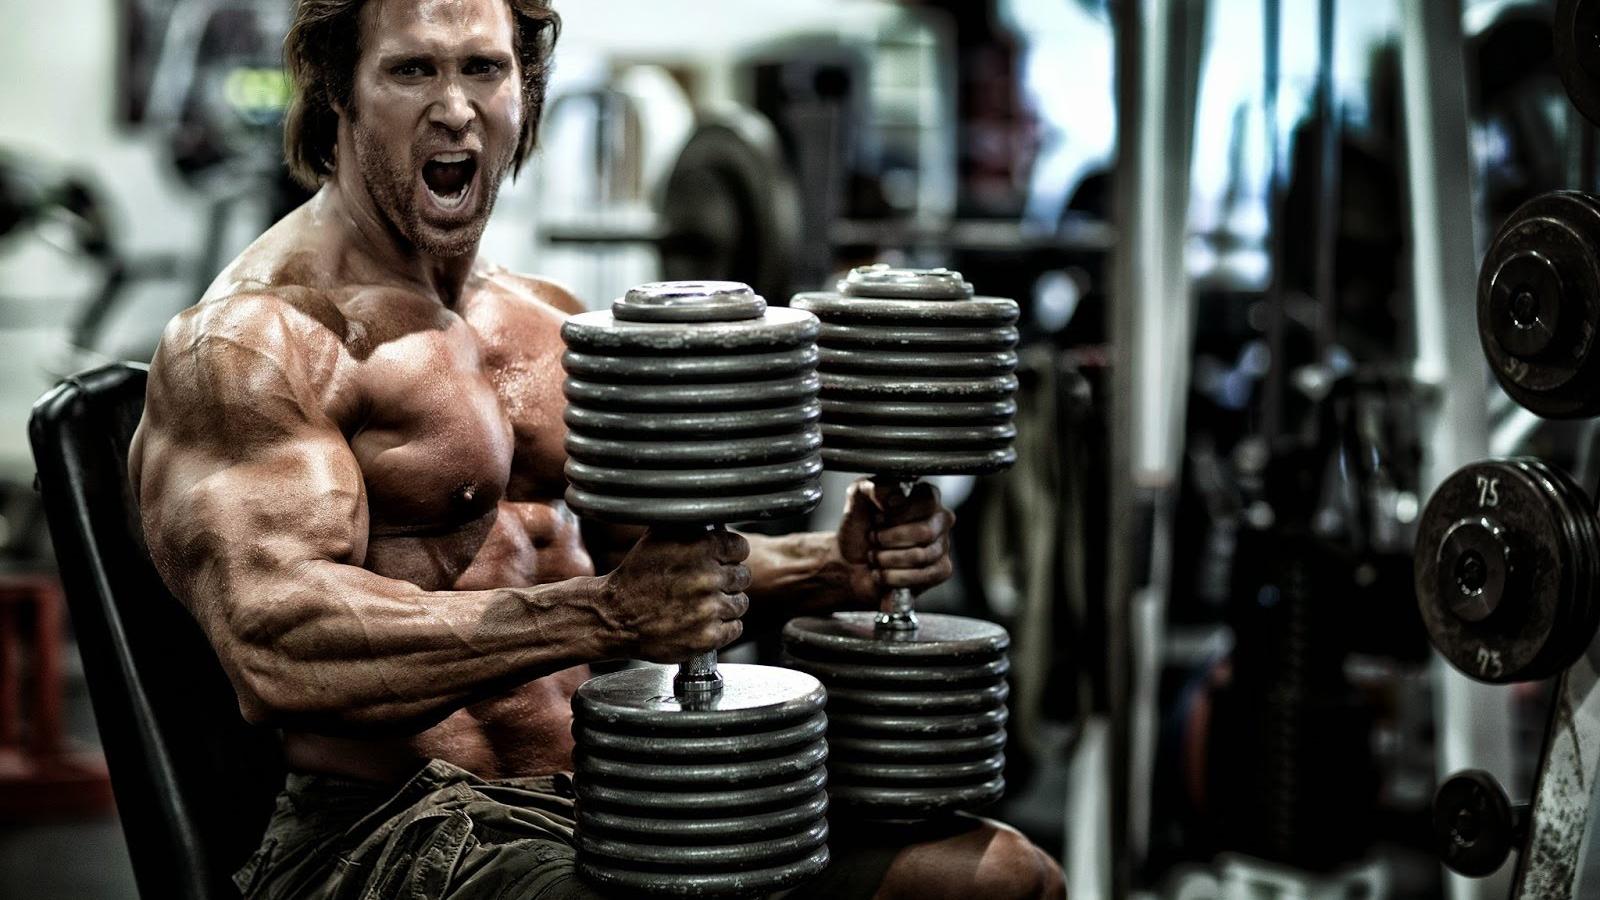 Mike O'Hearn gym workouts